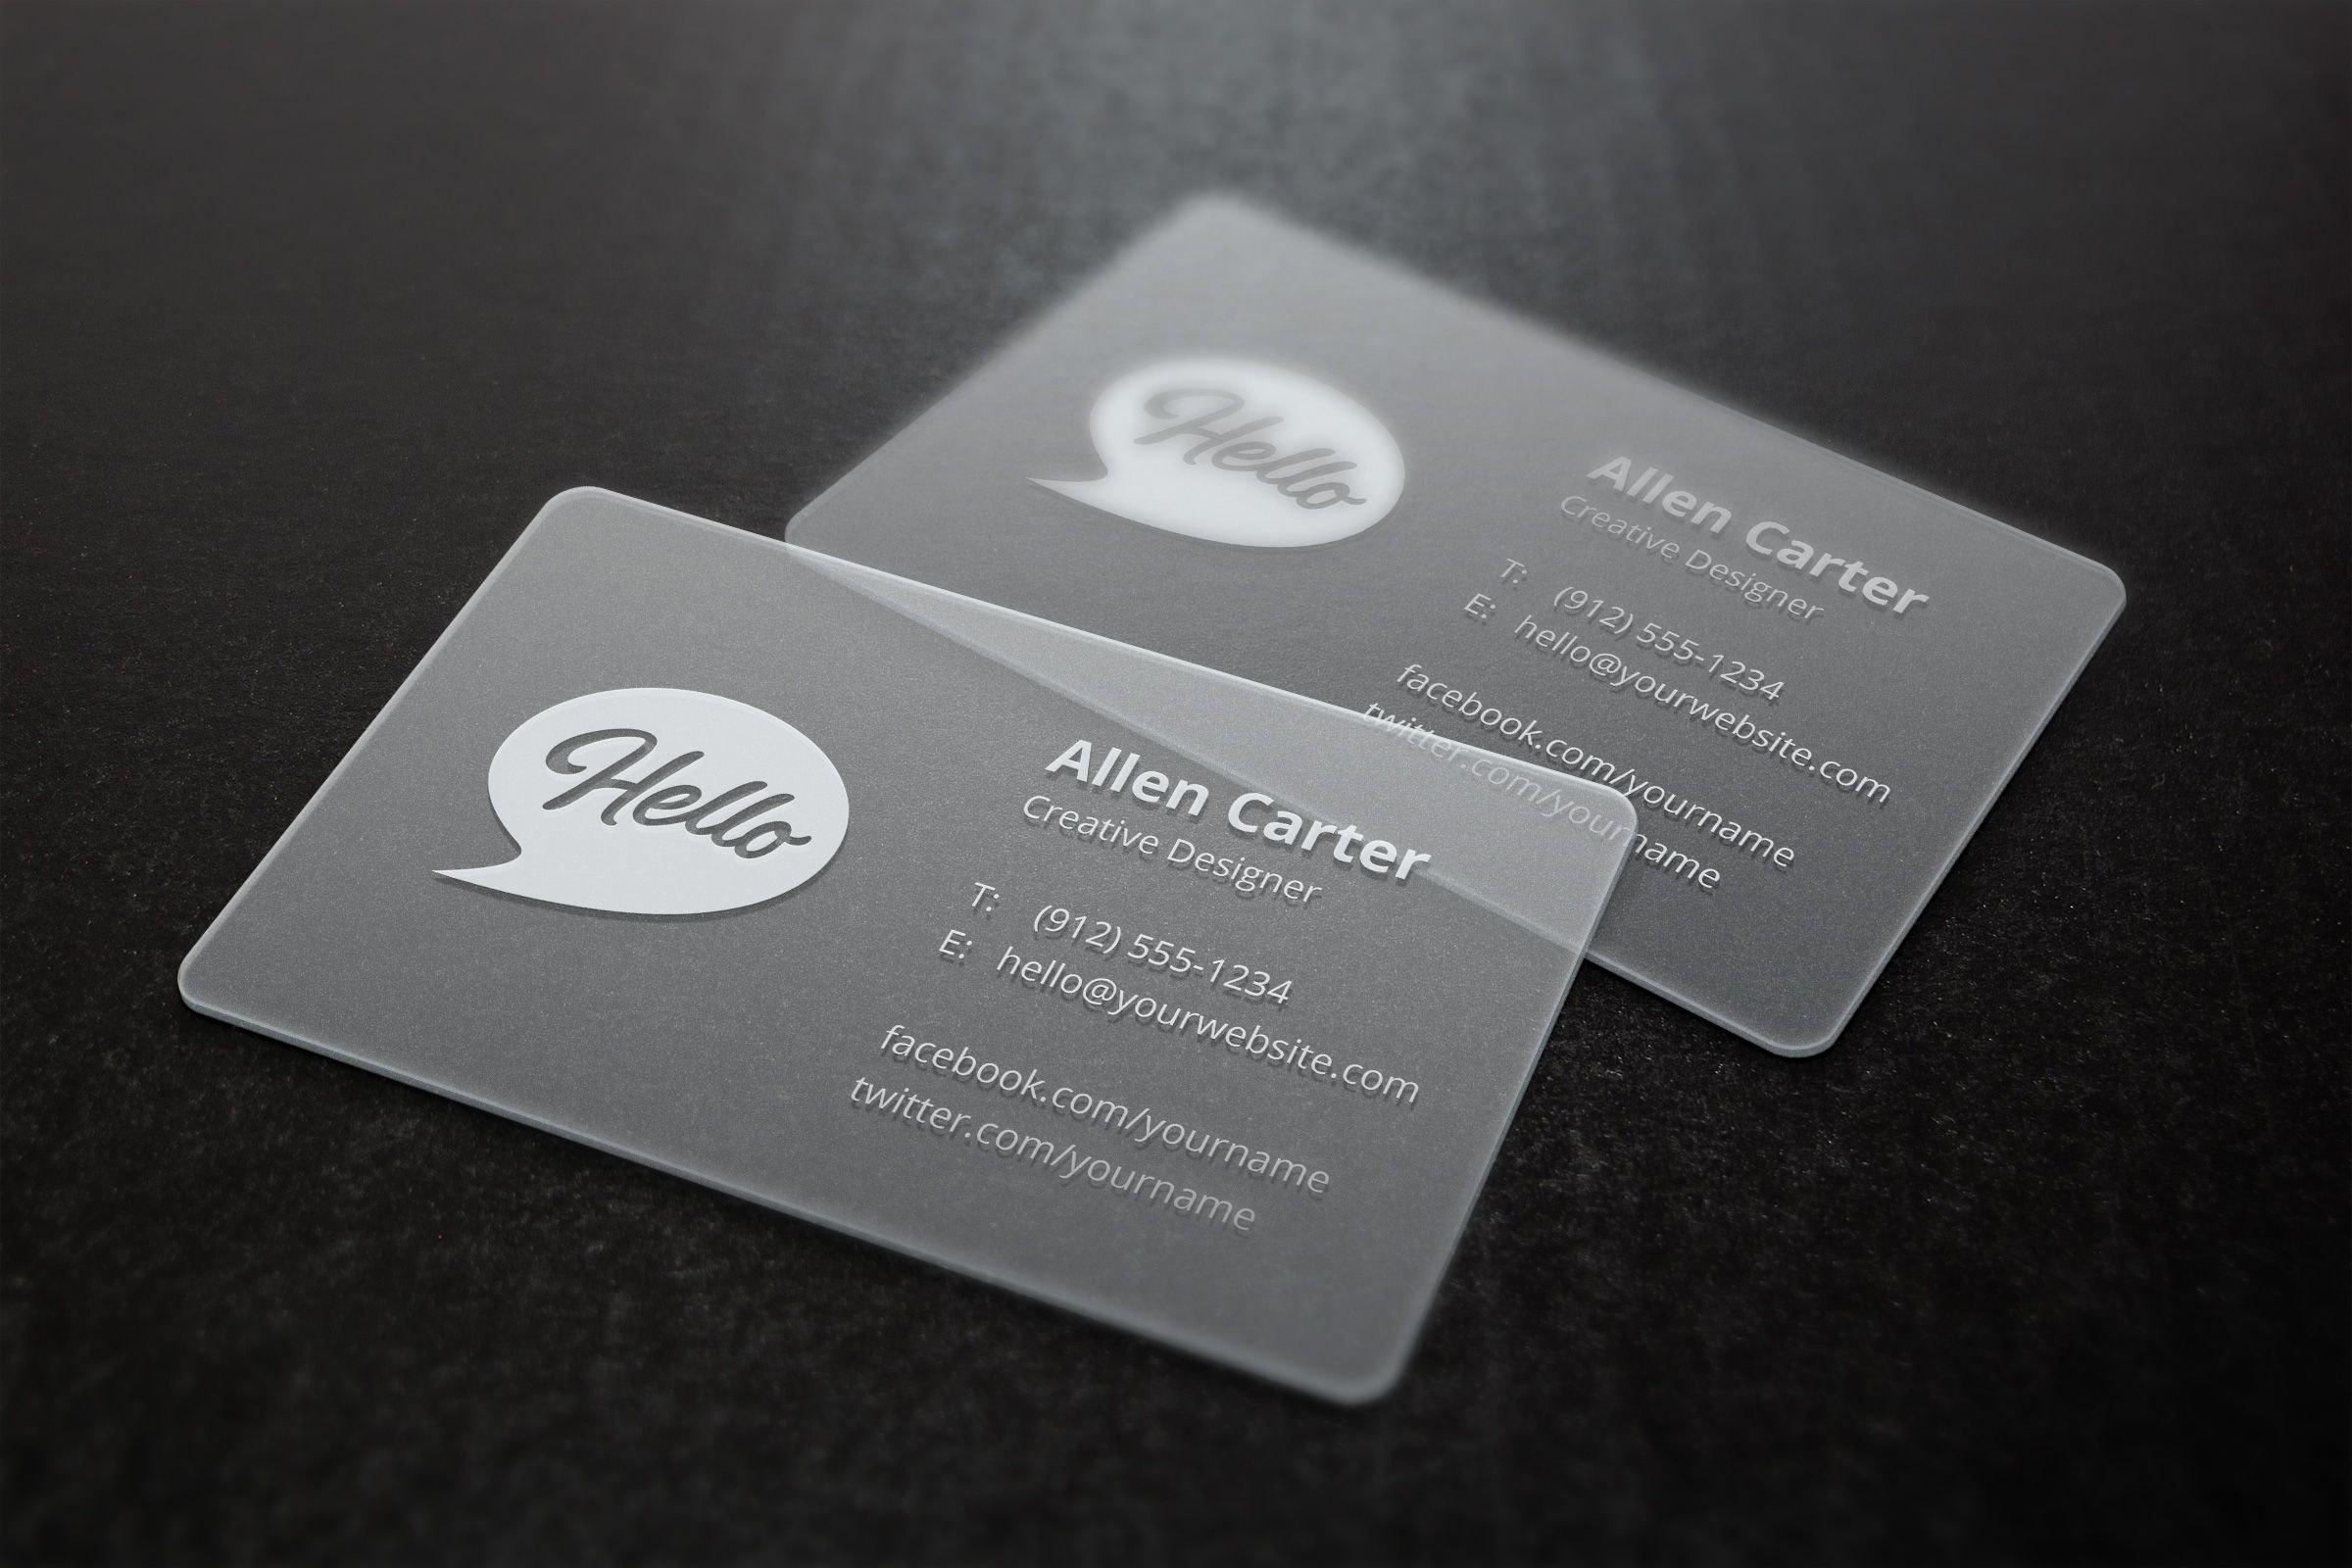 Translucent Business Cards Mockup  Design Resources  Plastic Intended For Transparent Business Cards Template